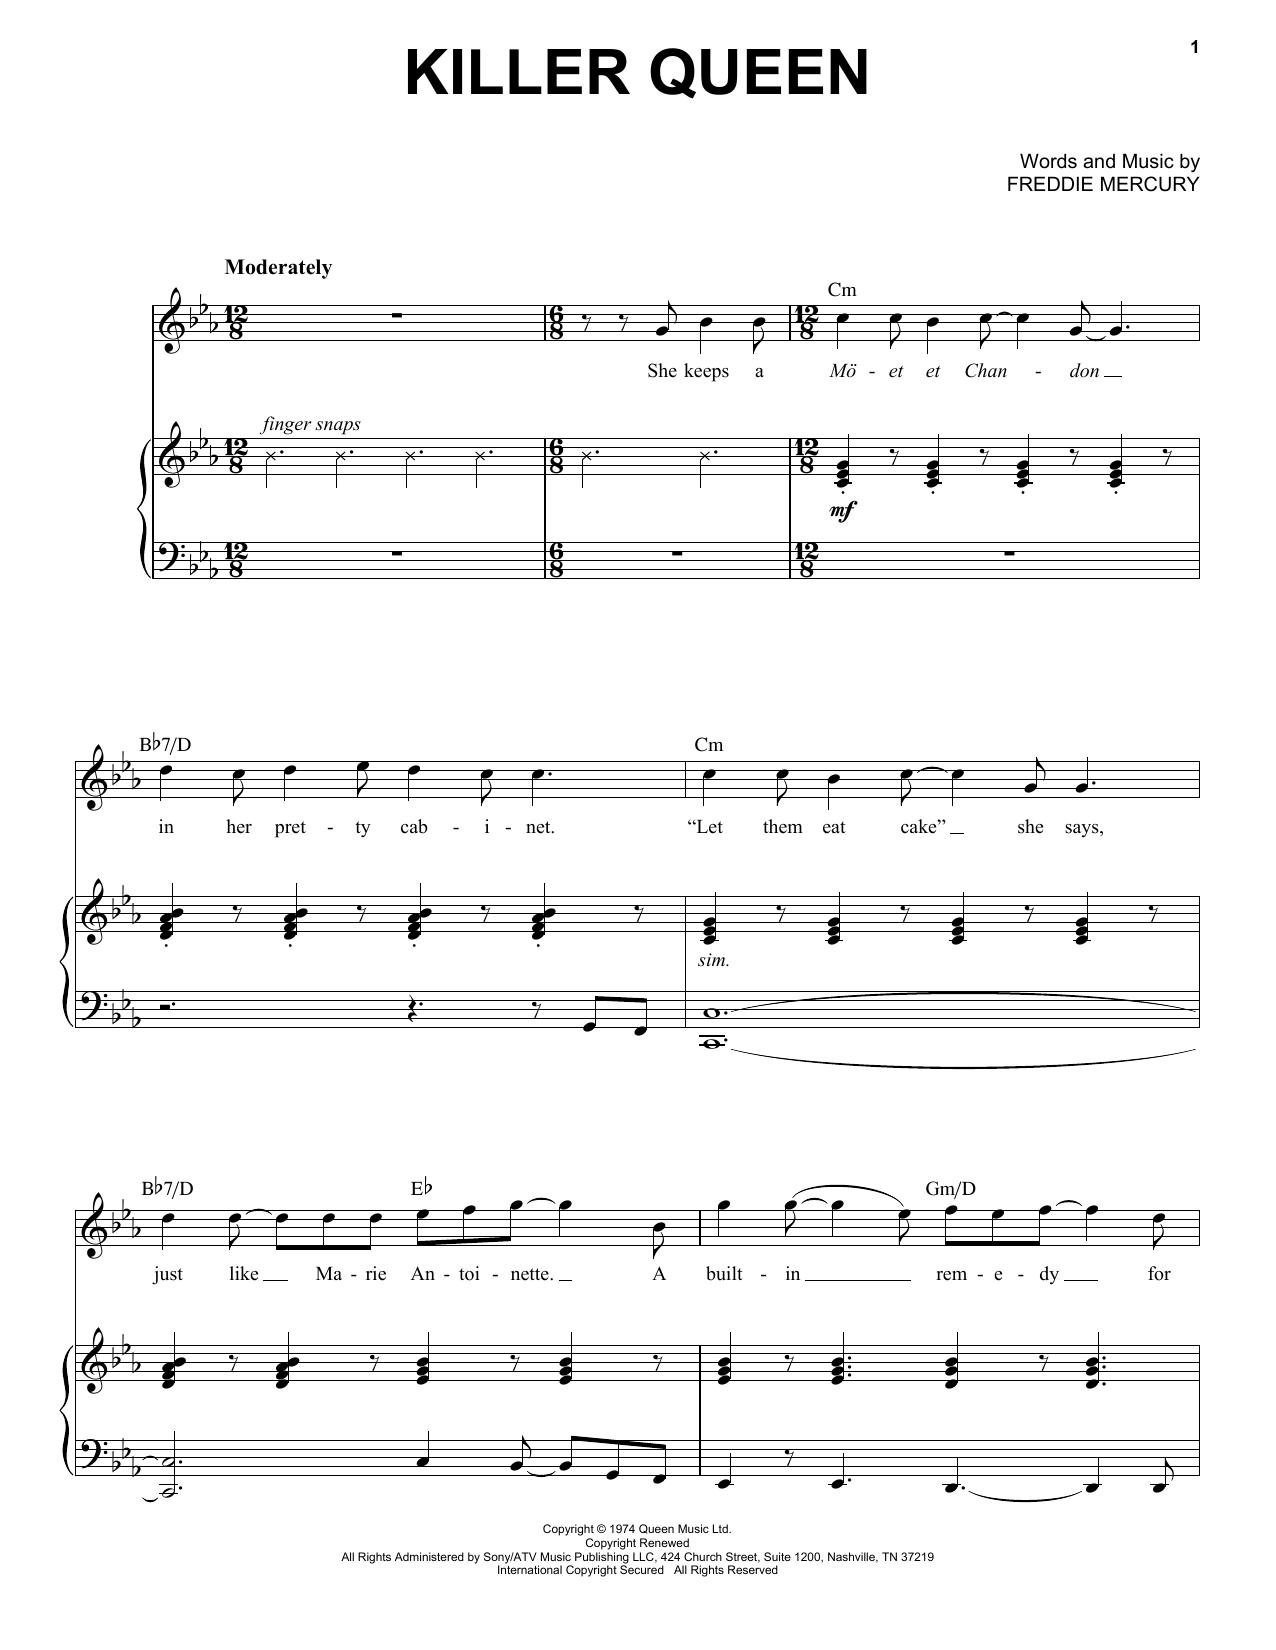 Killer Queen (Piano & Vocal) - Print Sheet Music Now